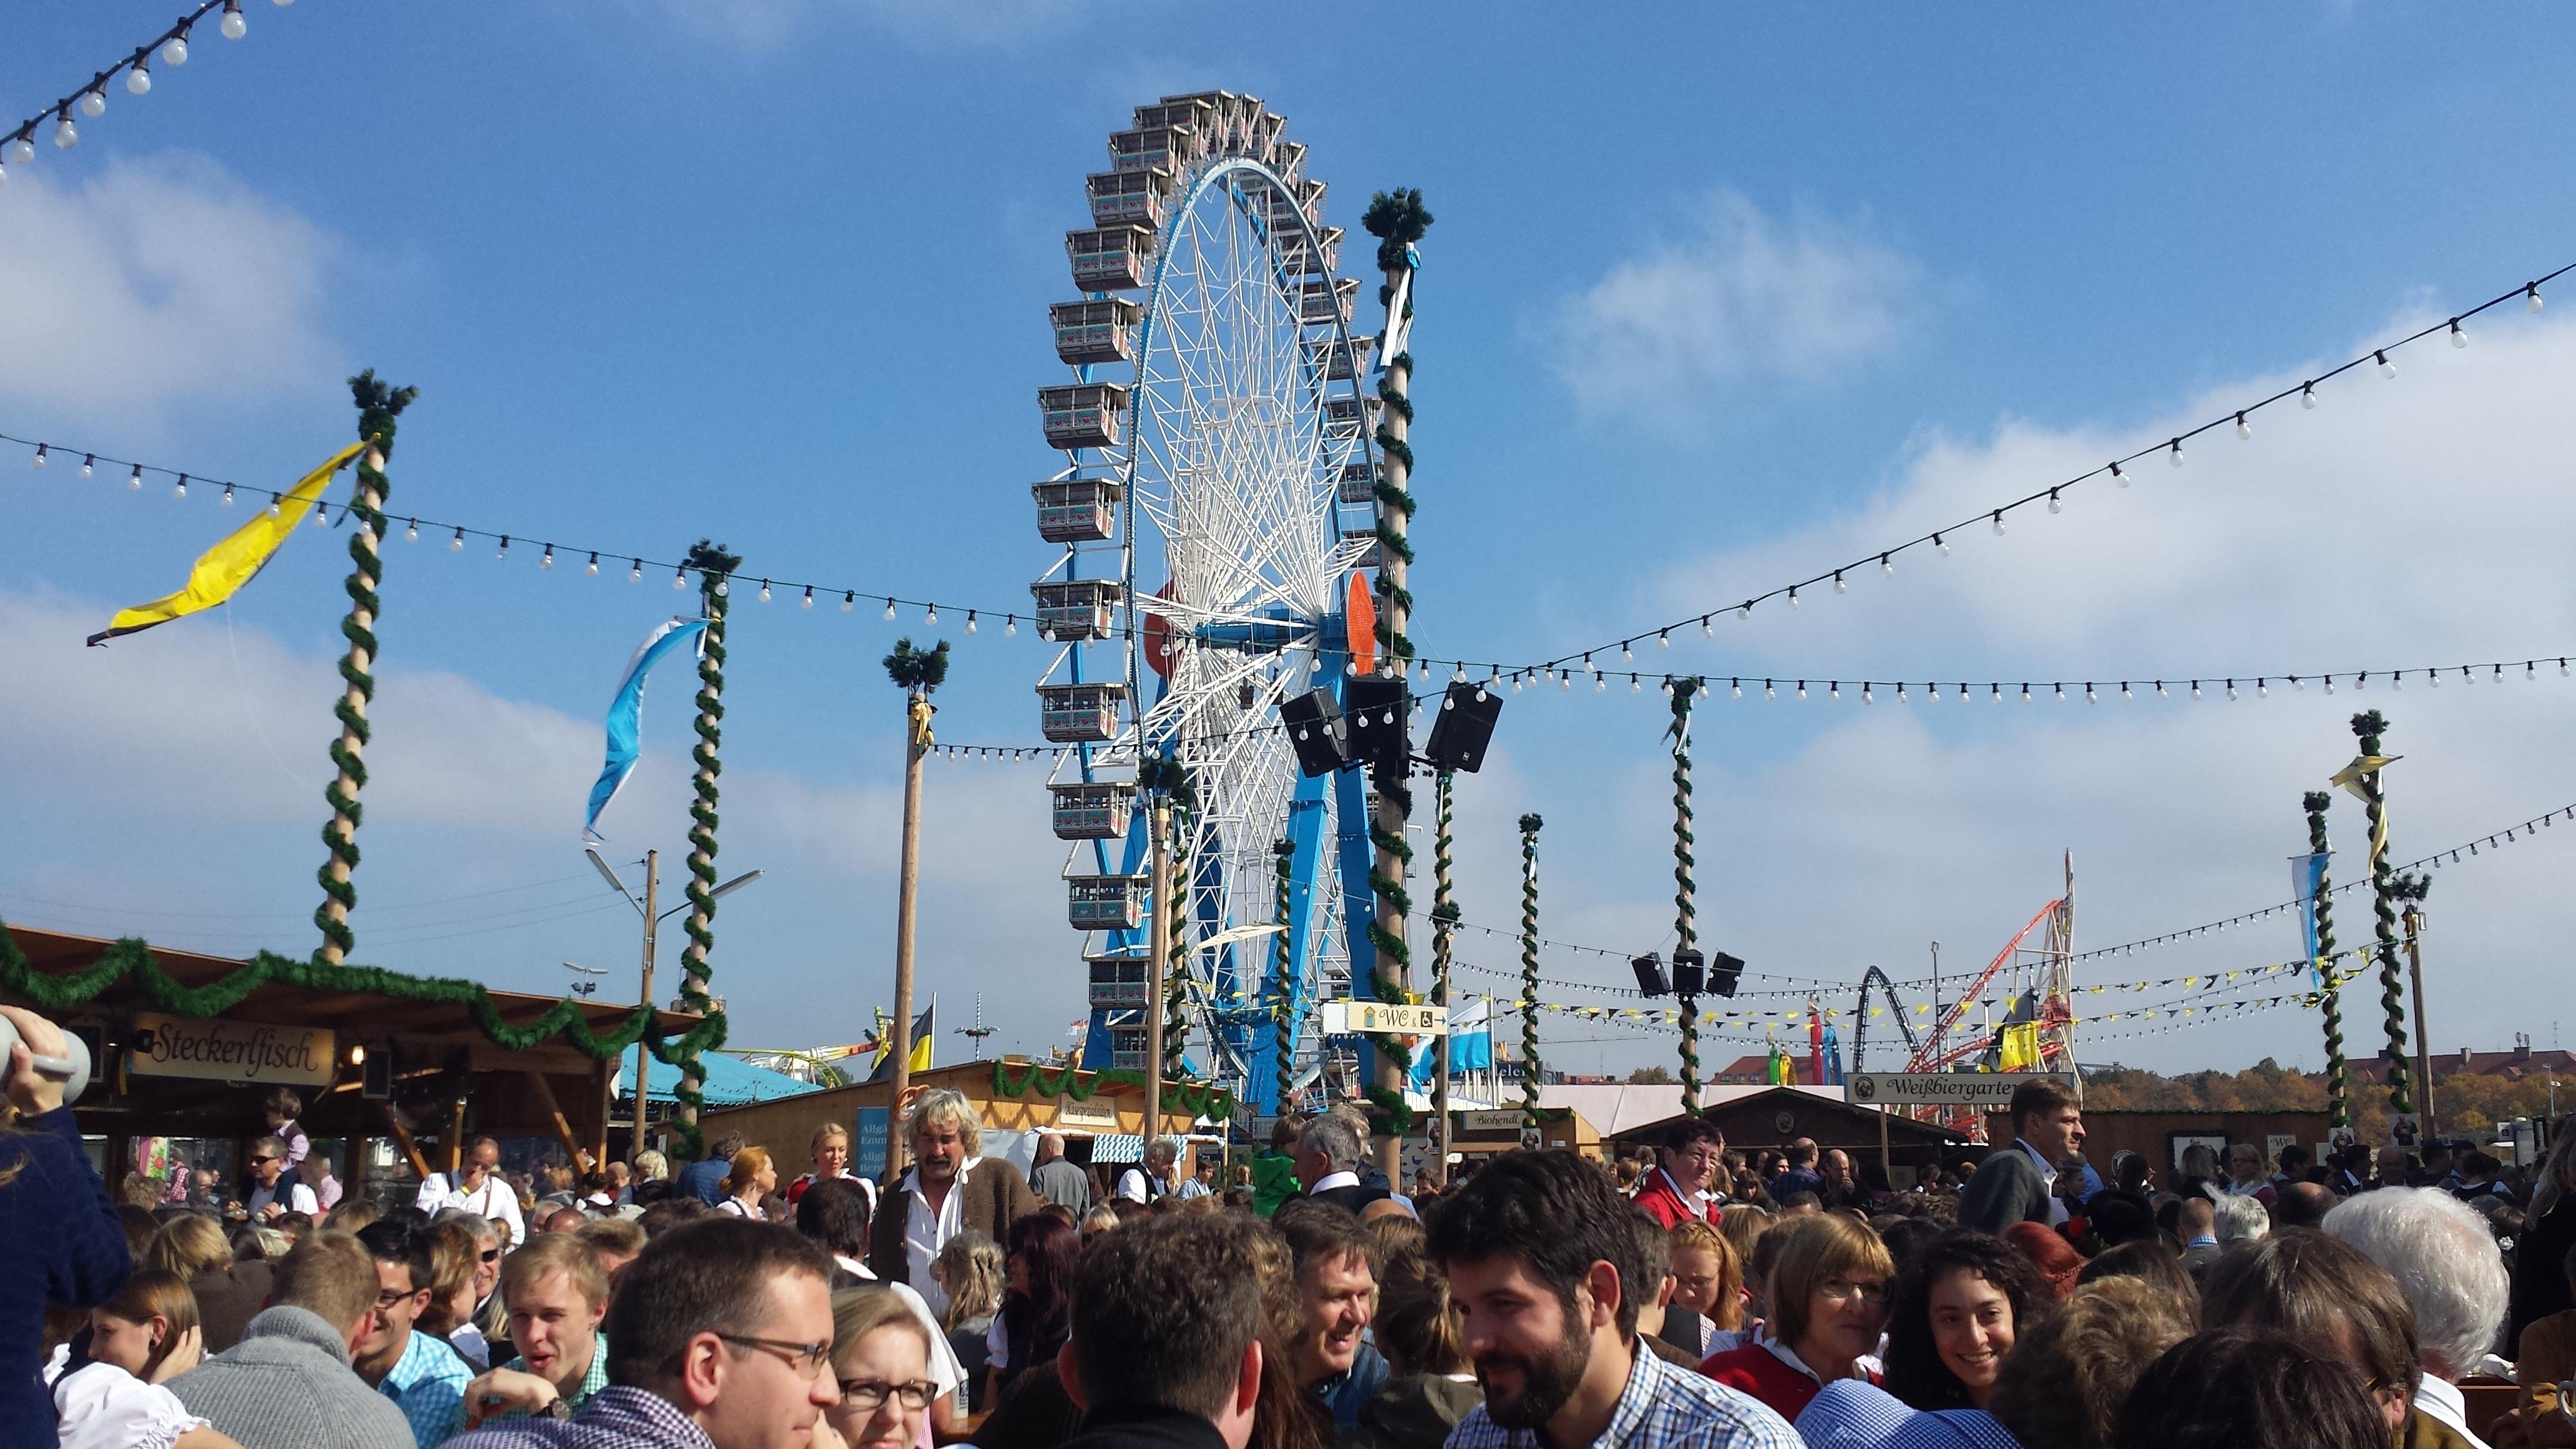 Free Images : people, crowd, pole, ferris wheel, carnival ...